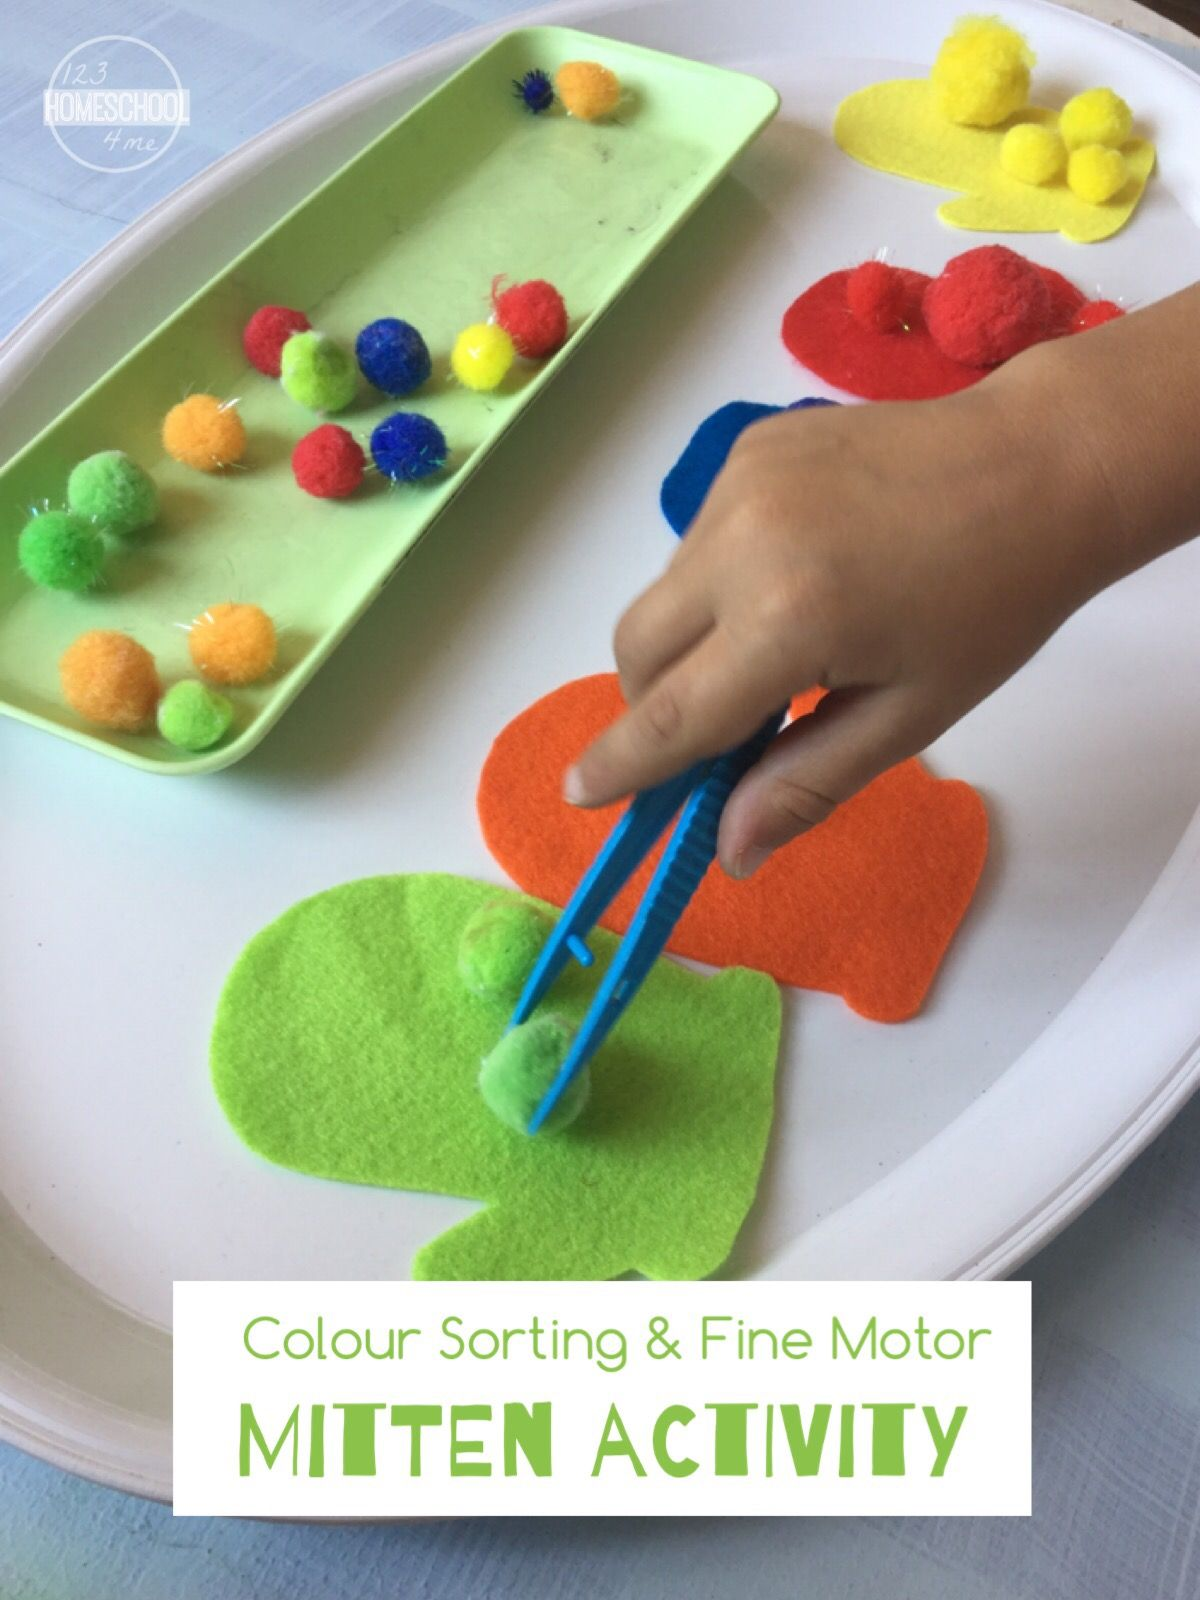 Color Sorting Mitten Activity